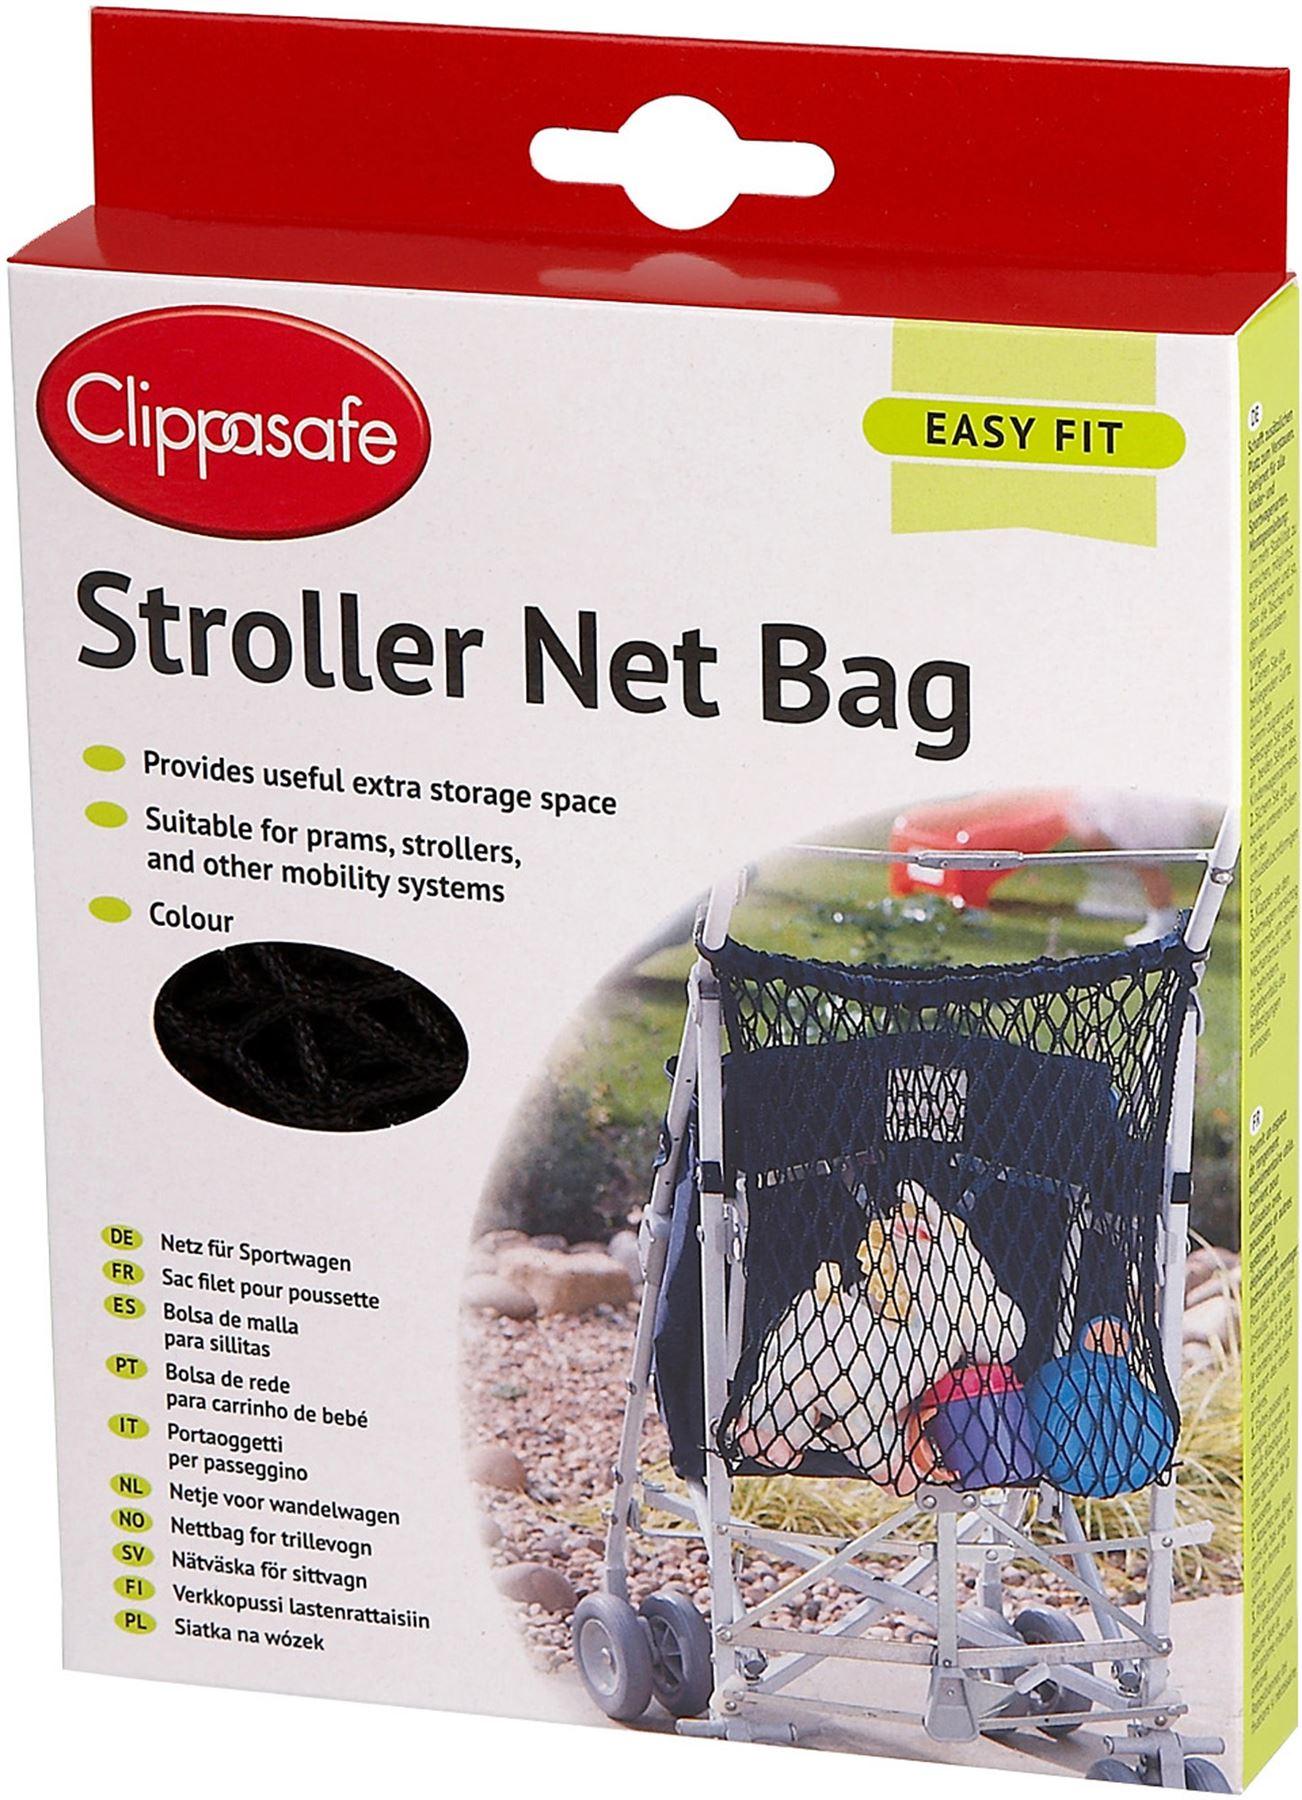 Clippasafe STROLLER NET BAG NAVY Pushchair//Stroller//Buggy Accessory BN